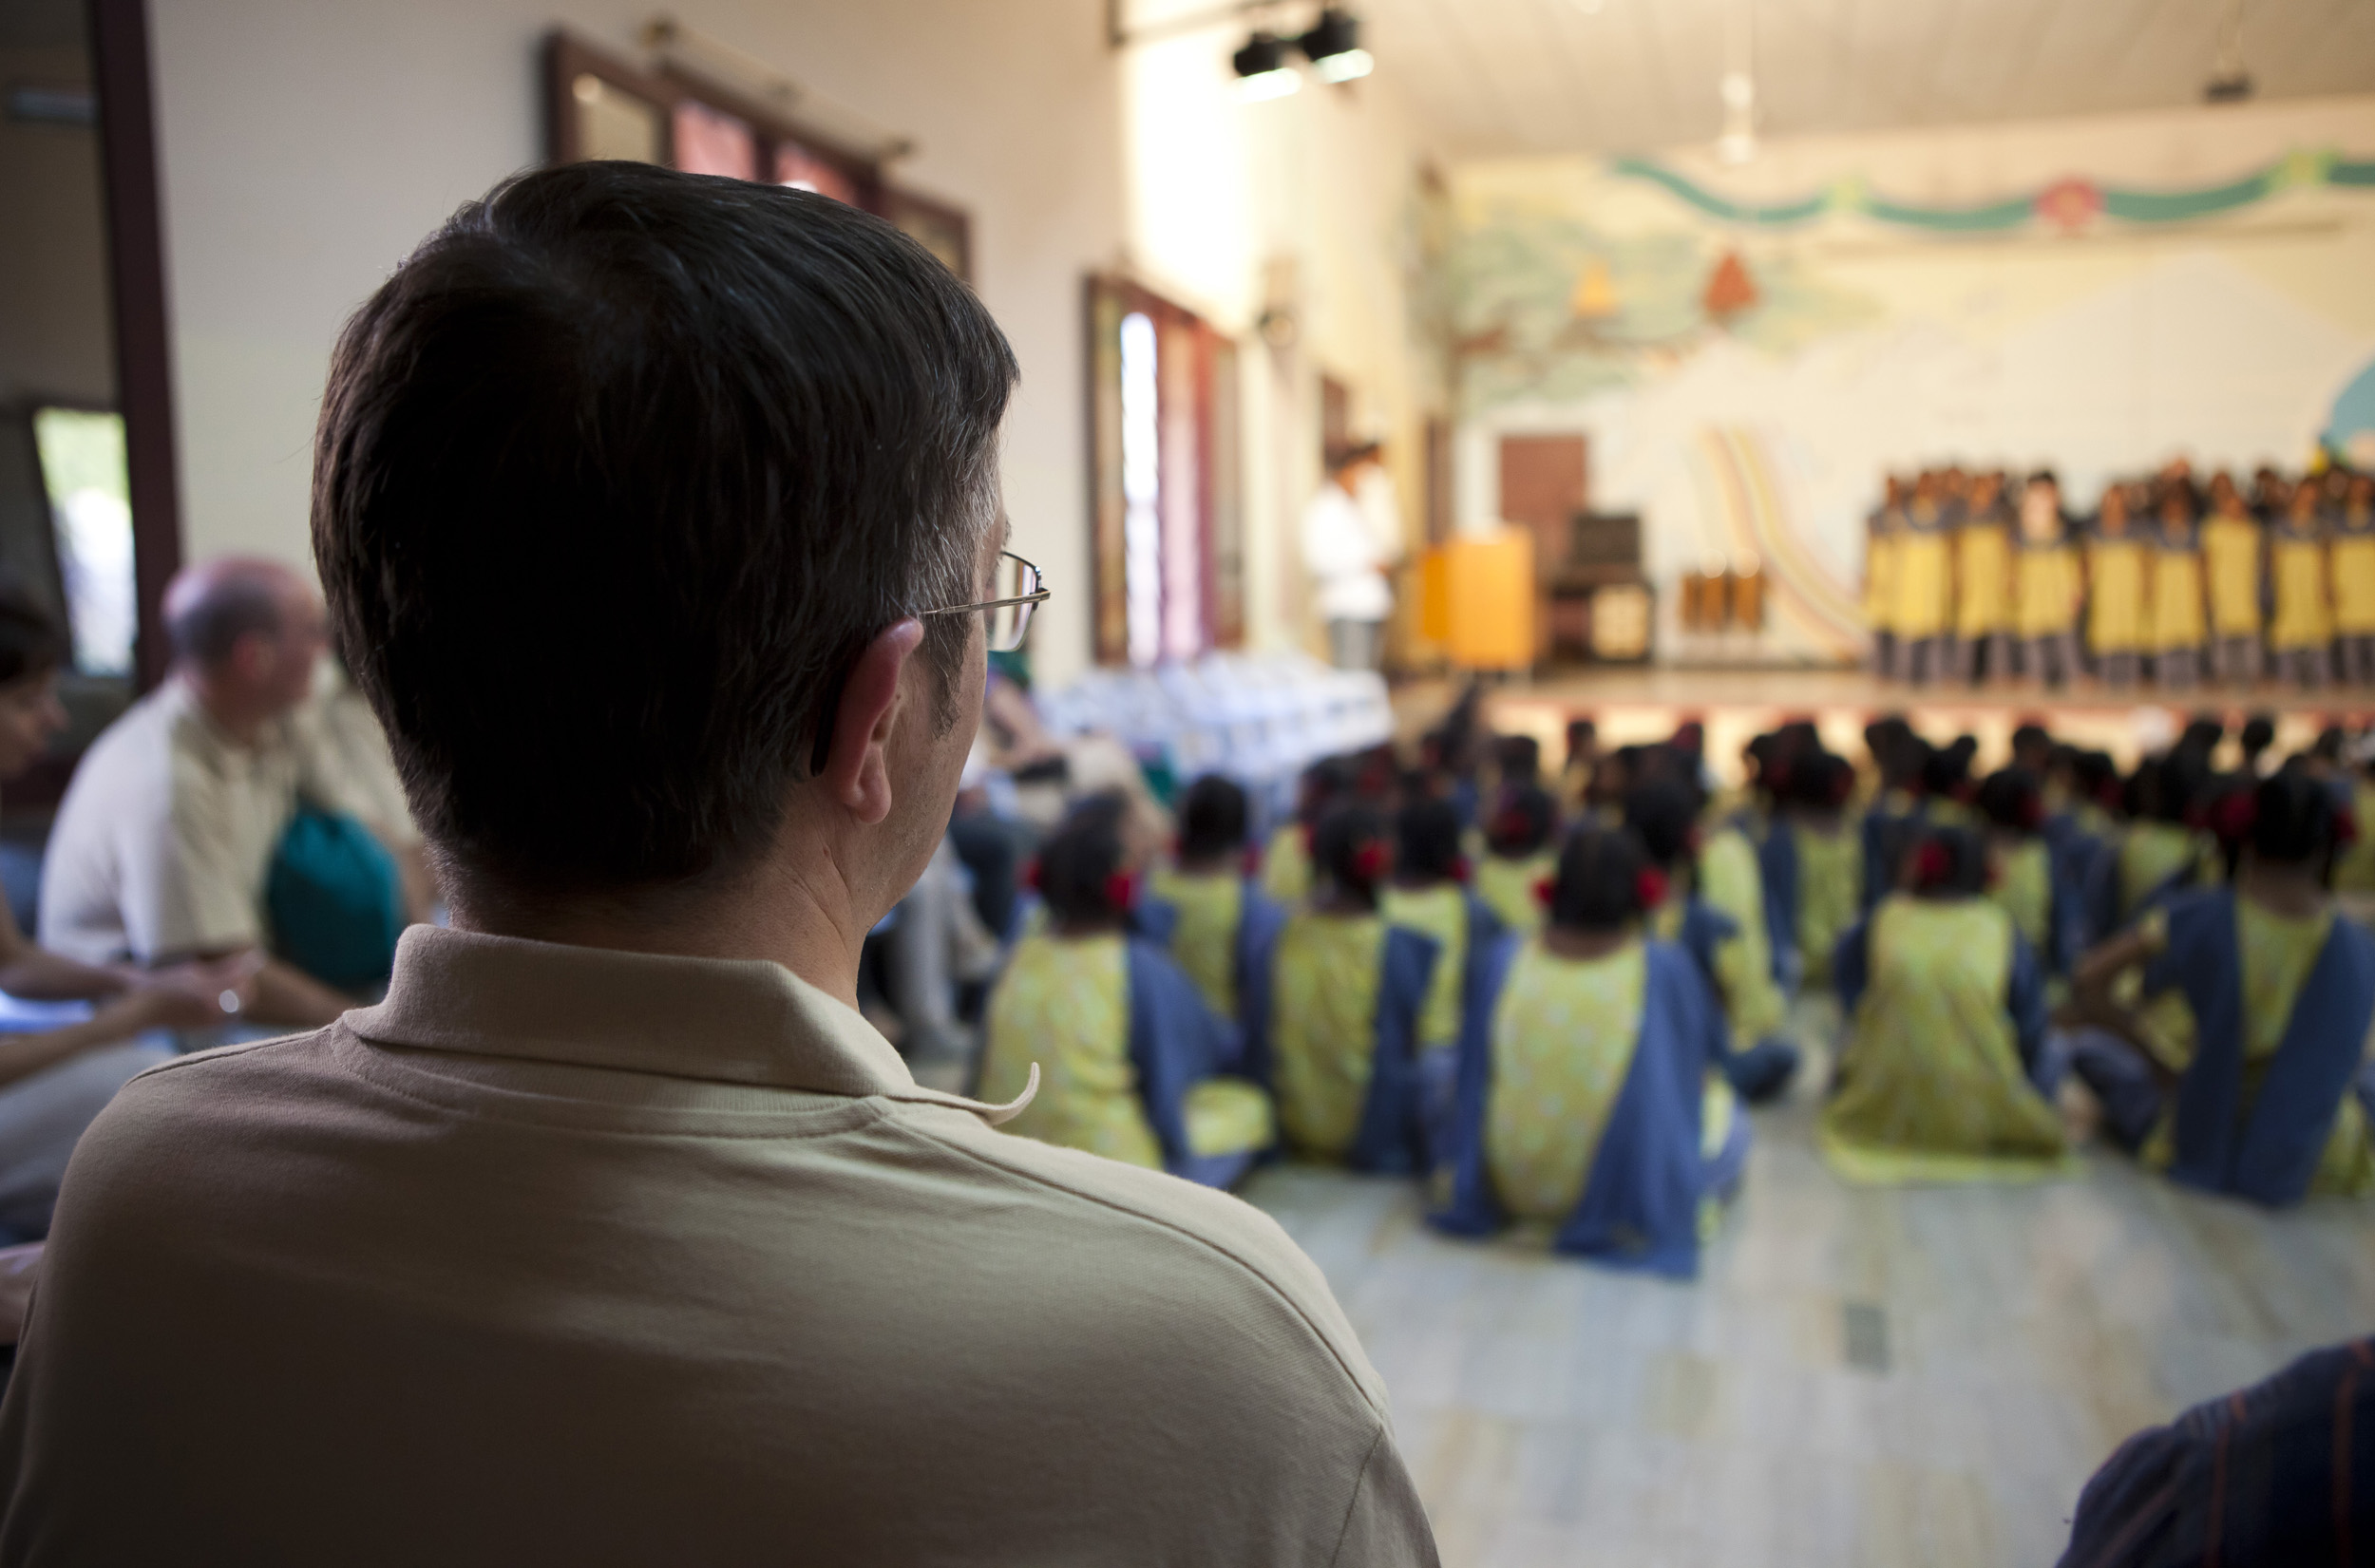 2012_03_17_vicente_ferrer_escuelas11.jpg